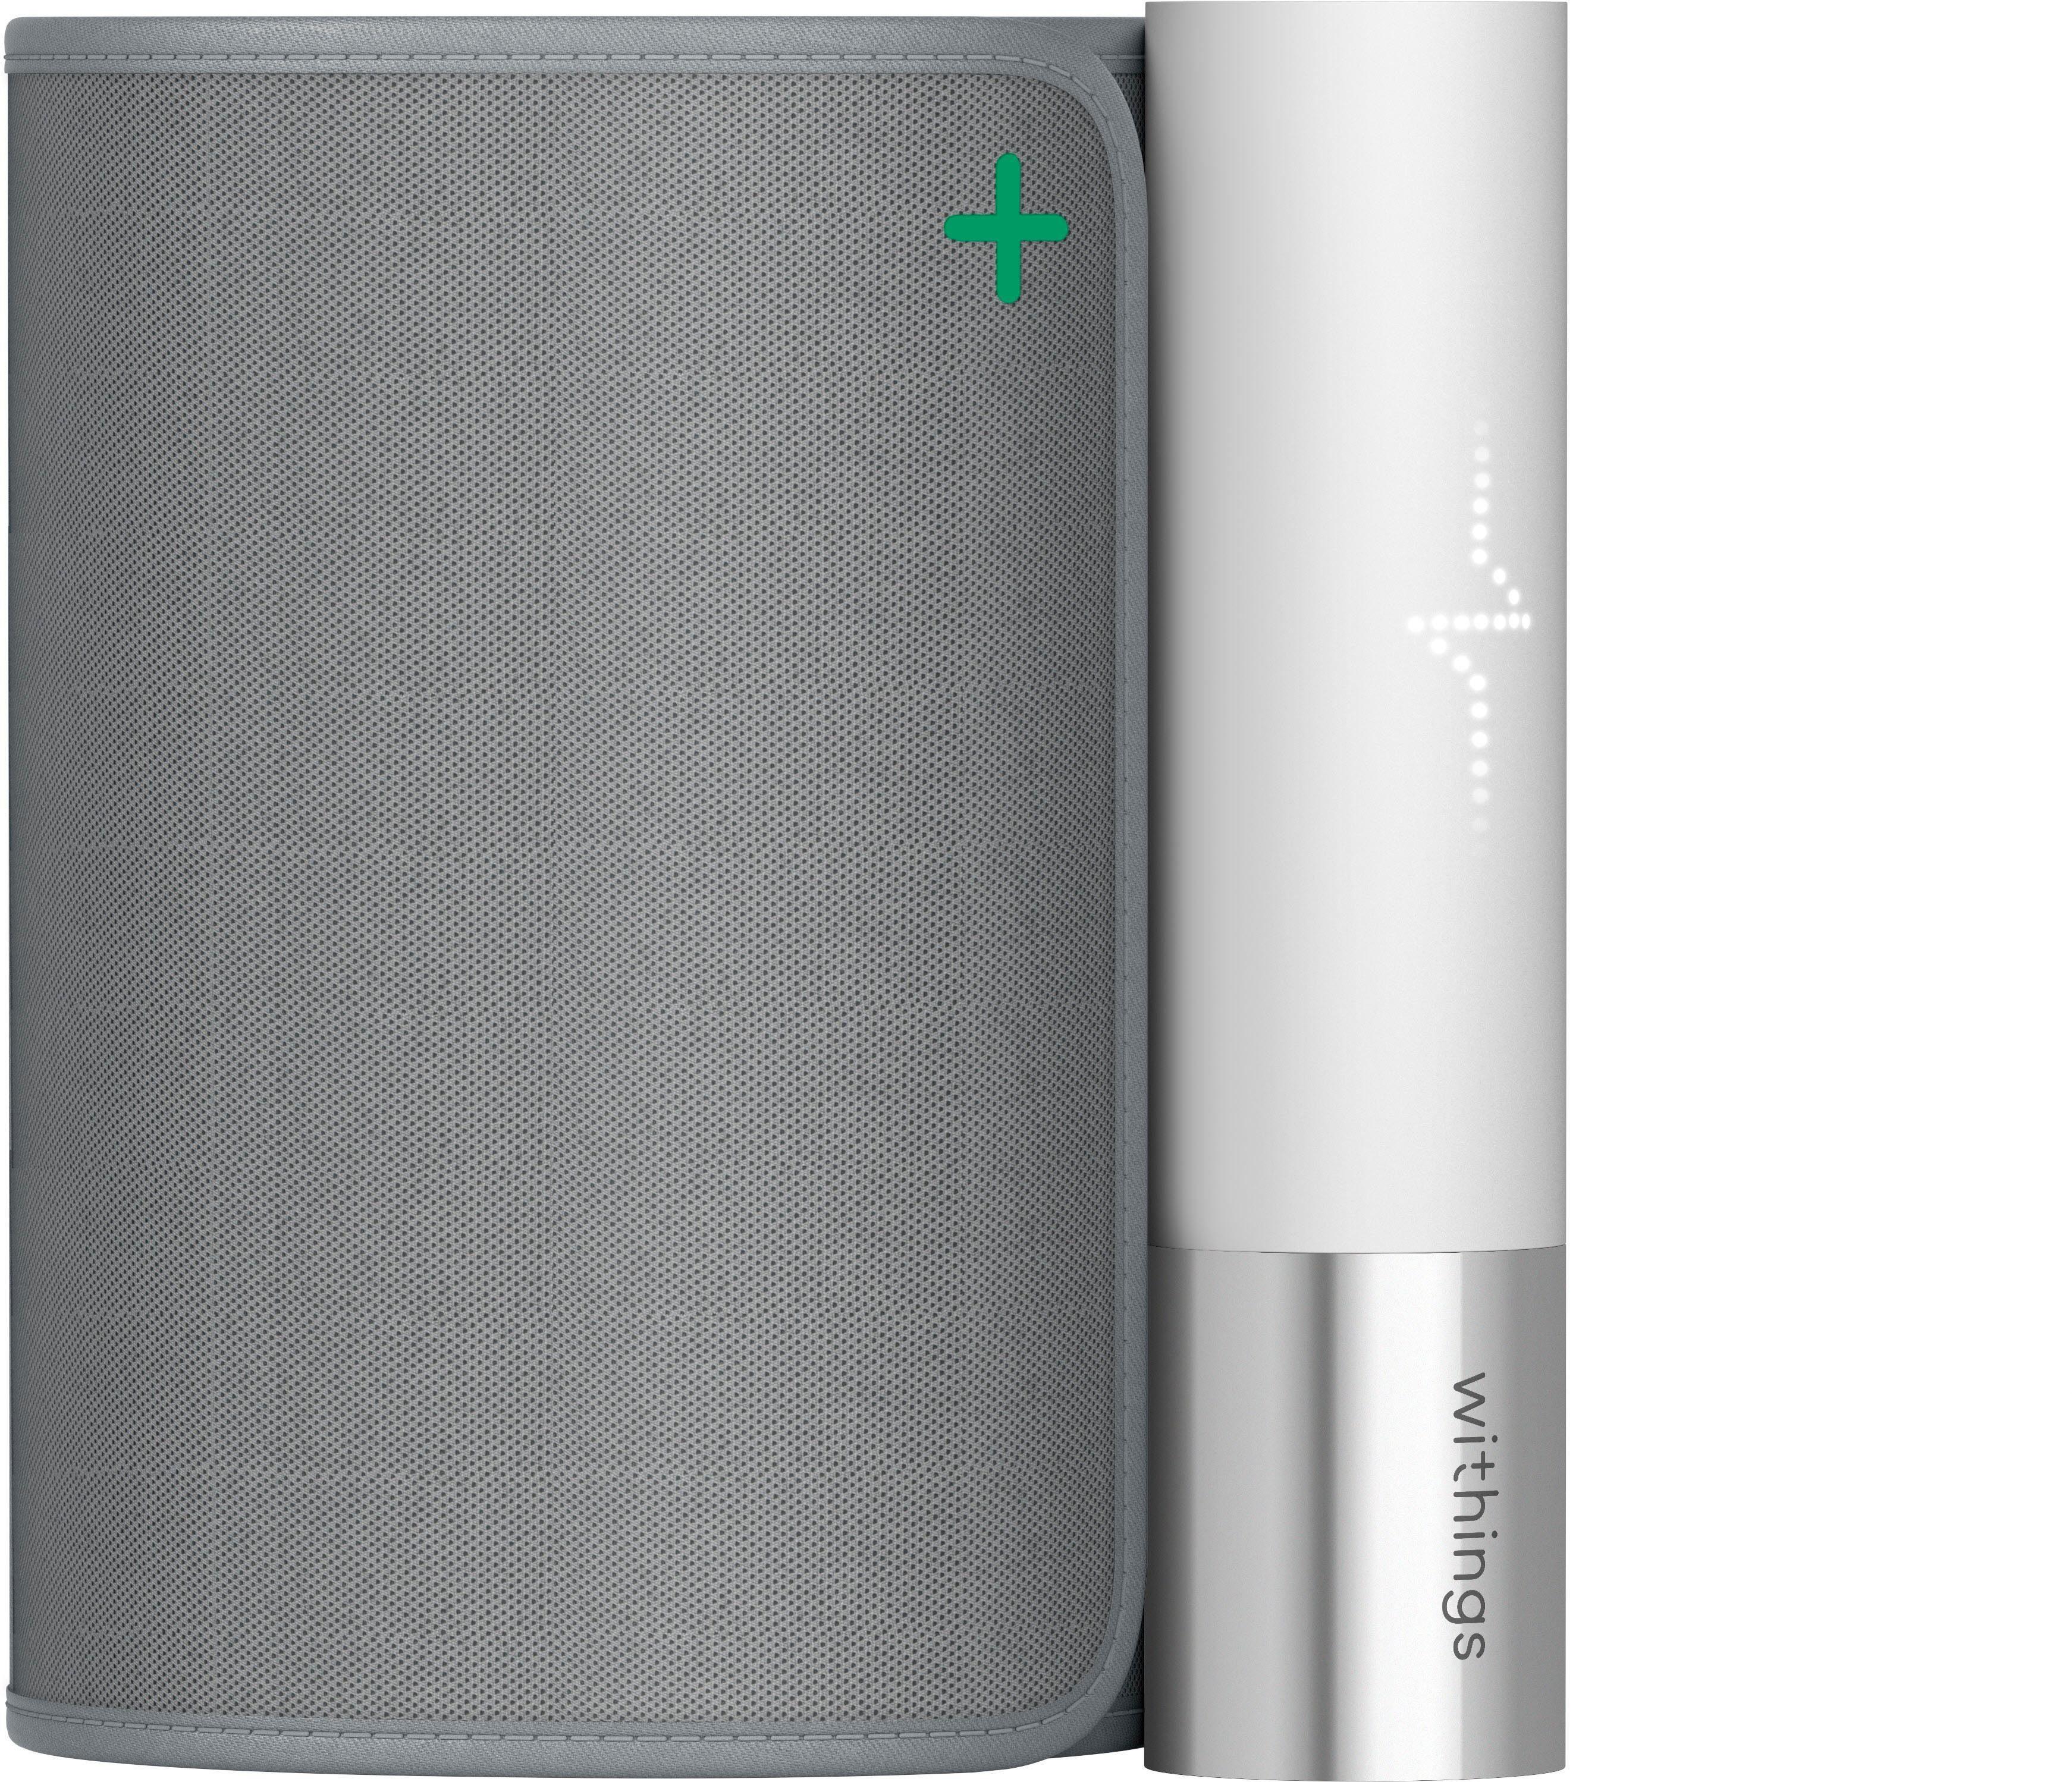 WITHINGS Nokia BPM Coreu0026tradeWPM04-ALL-INTER Blood Pressure Monitor